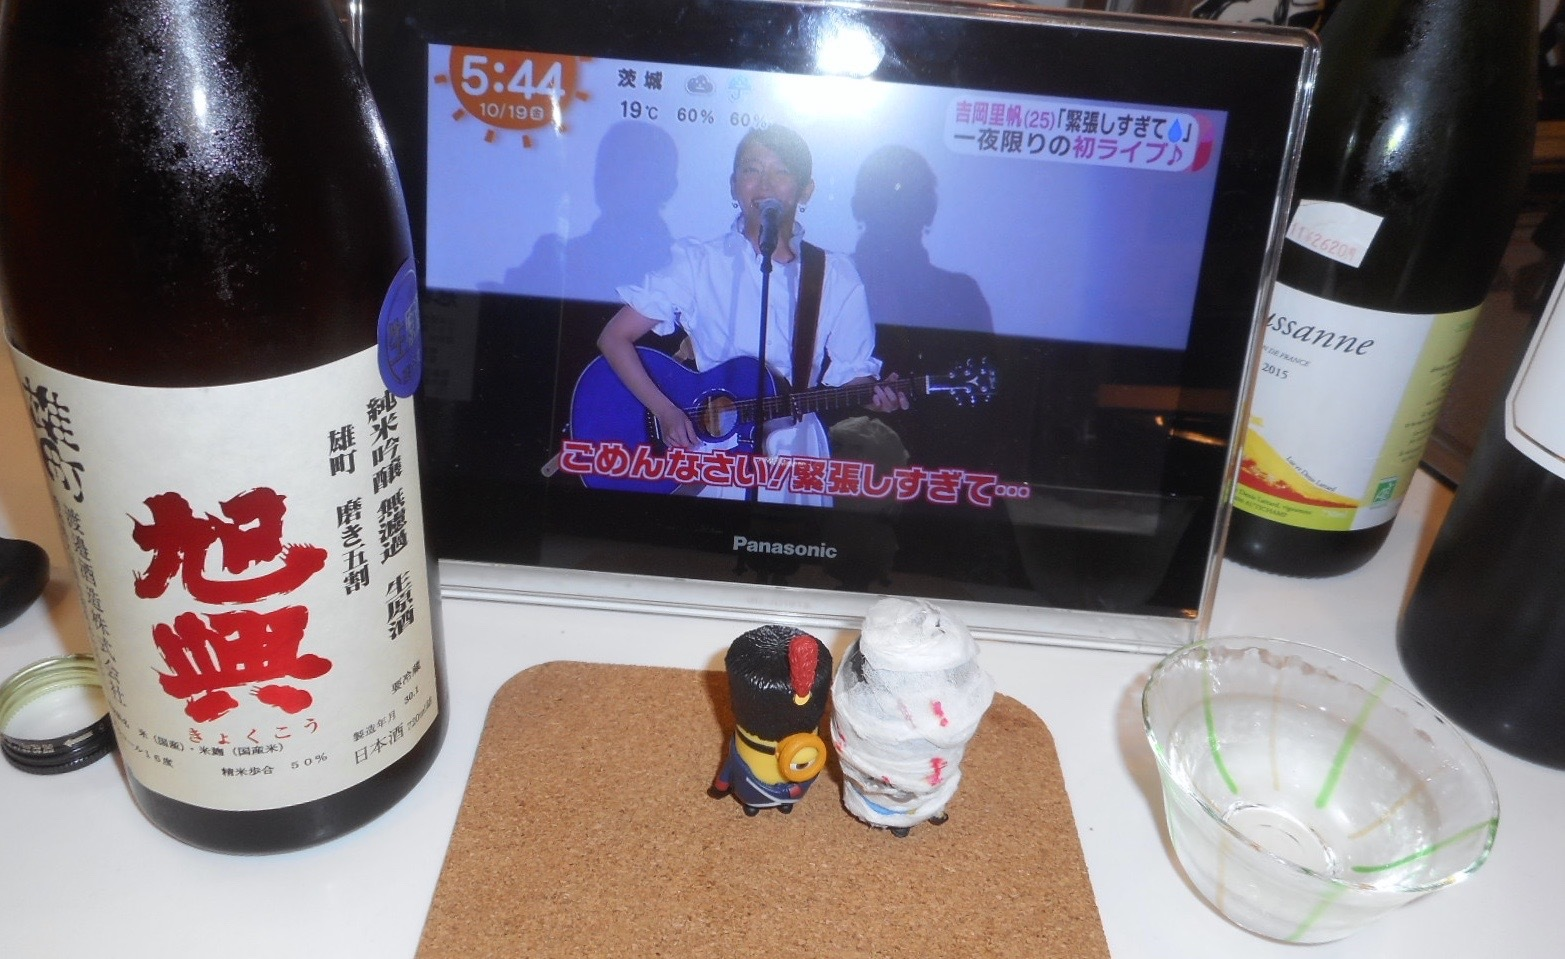 kyokukou_omachi50namagen29by3_3.jpg